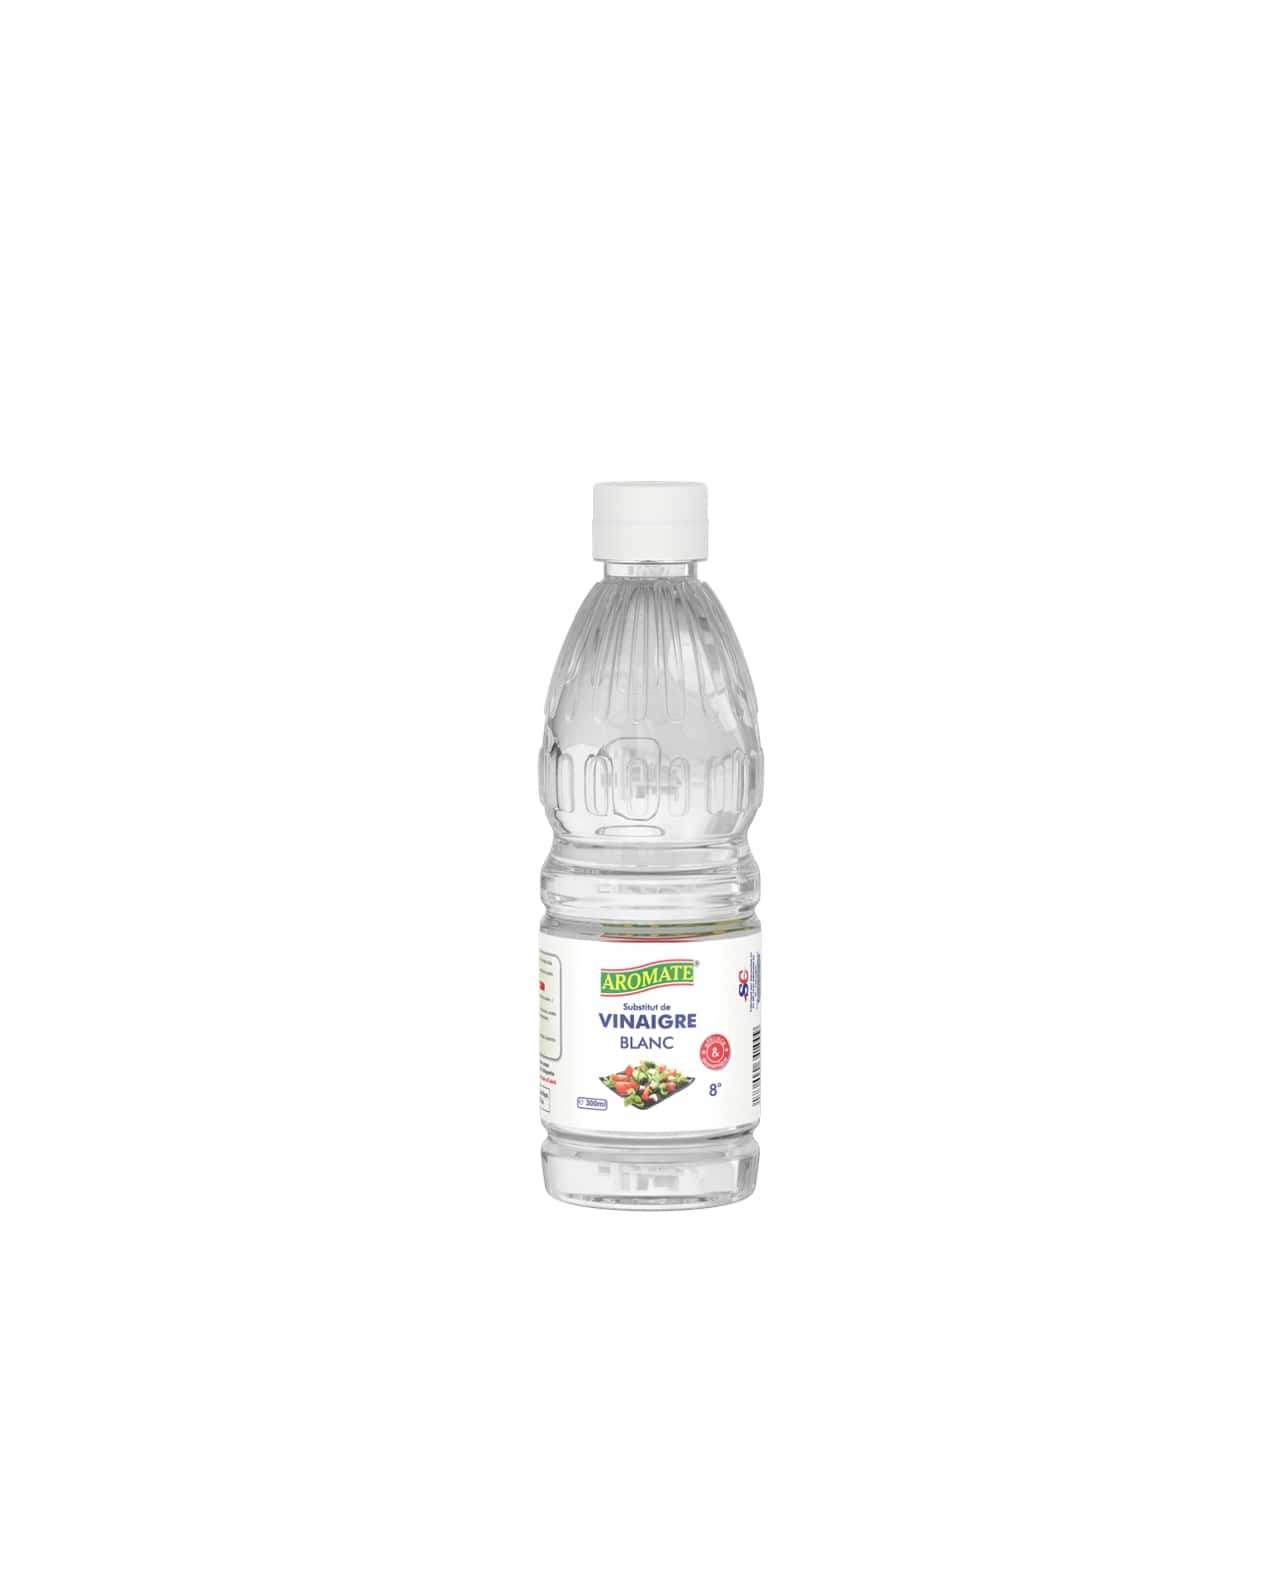 vinaigre blanc 300ml